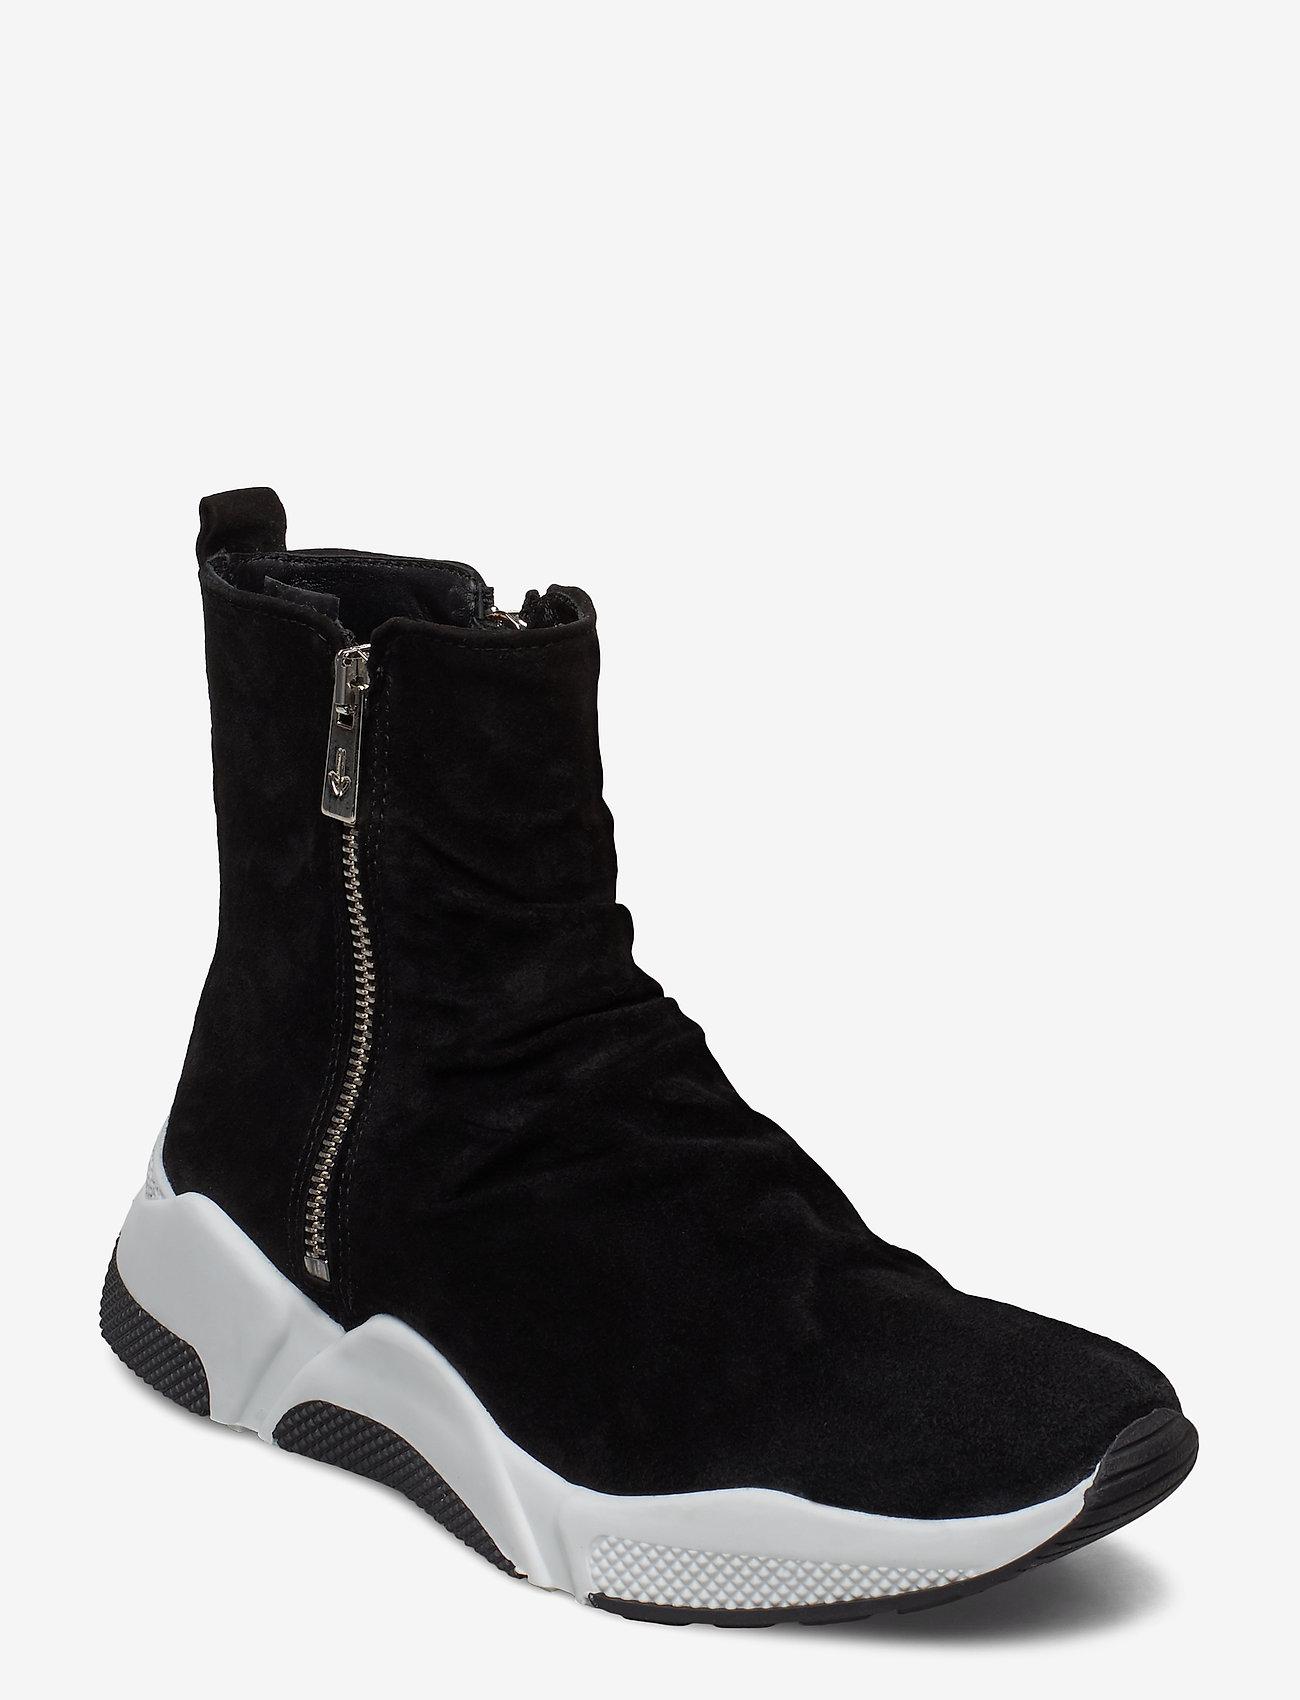 Billi Bi - Sport 4865 - sneakers med høy ankel - black babysilk suede 500 - 0